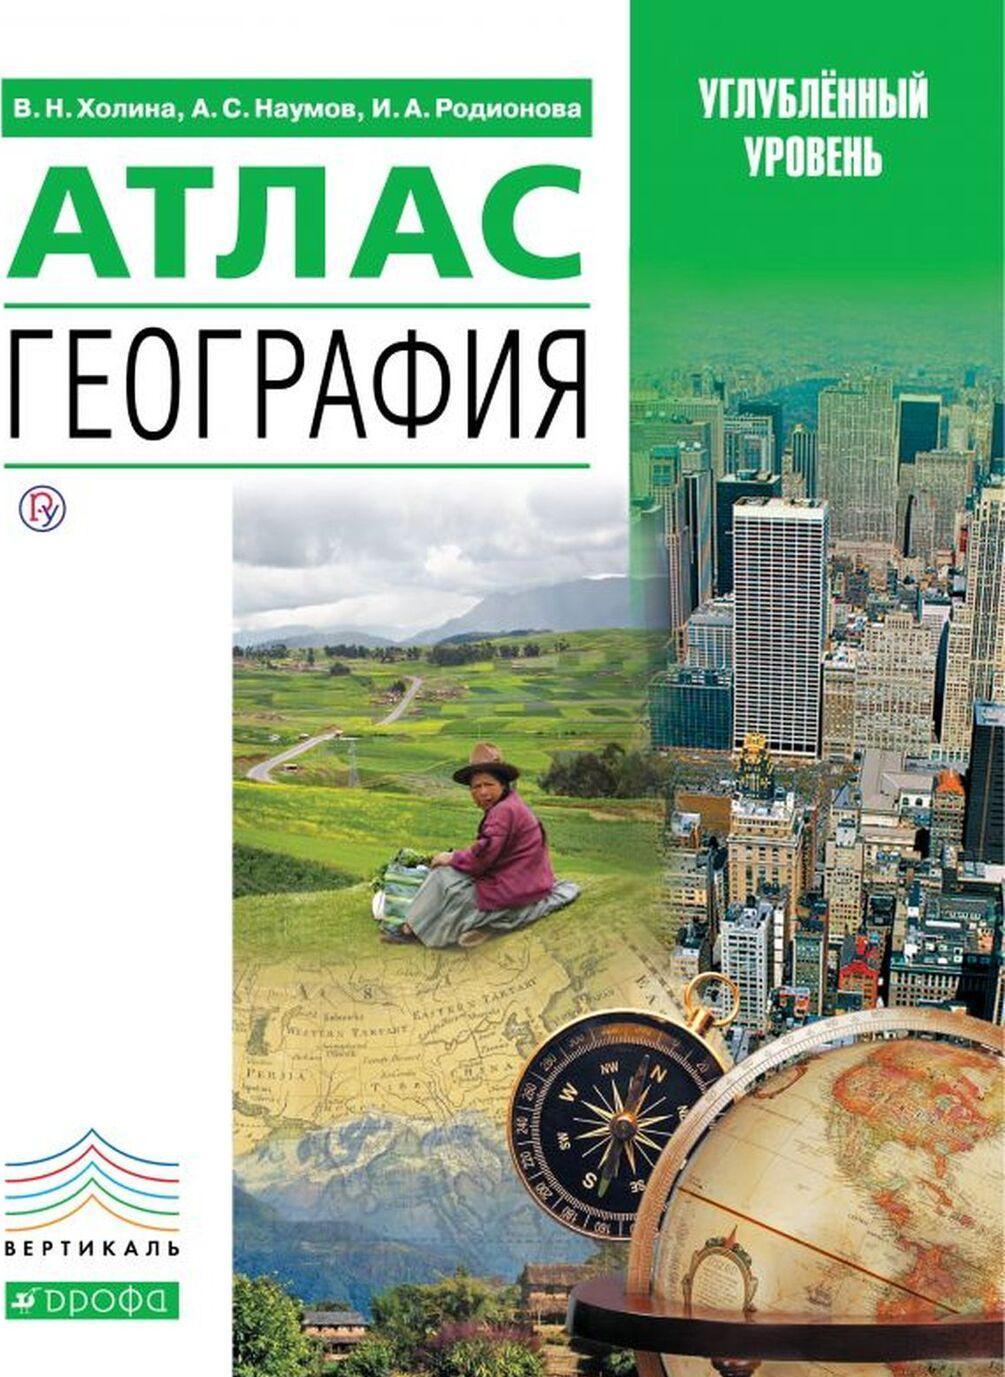 Geografija. Atlas | Kholina Veronika Nikolaevna, Naumov Aleksej Stanislavovich